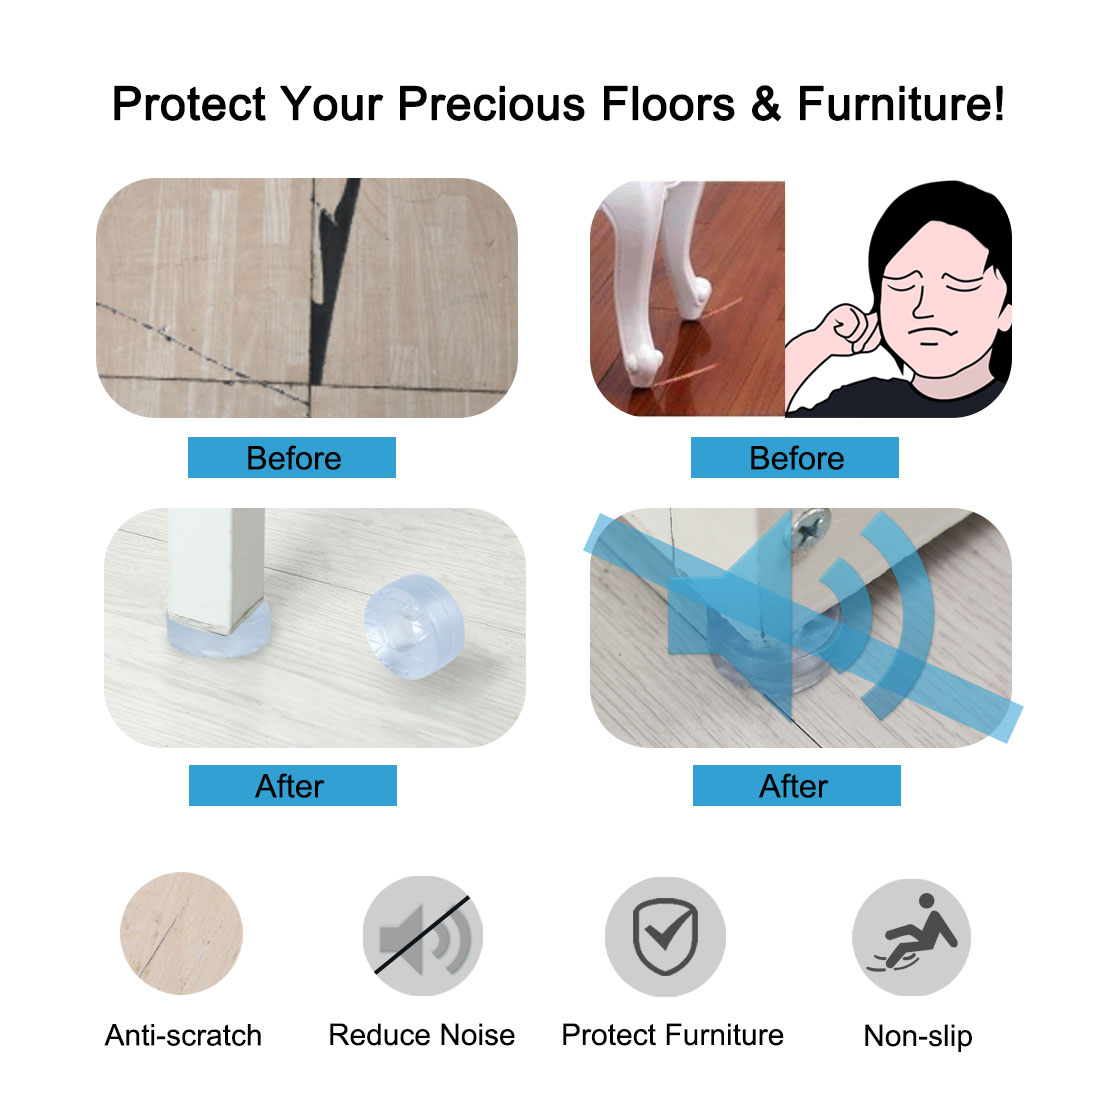 2pcs Round Rubber Feet Leg Pads Anti-scratch for Chair Leg Floor Protector 15mm - image 3 de 7